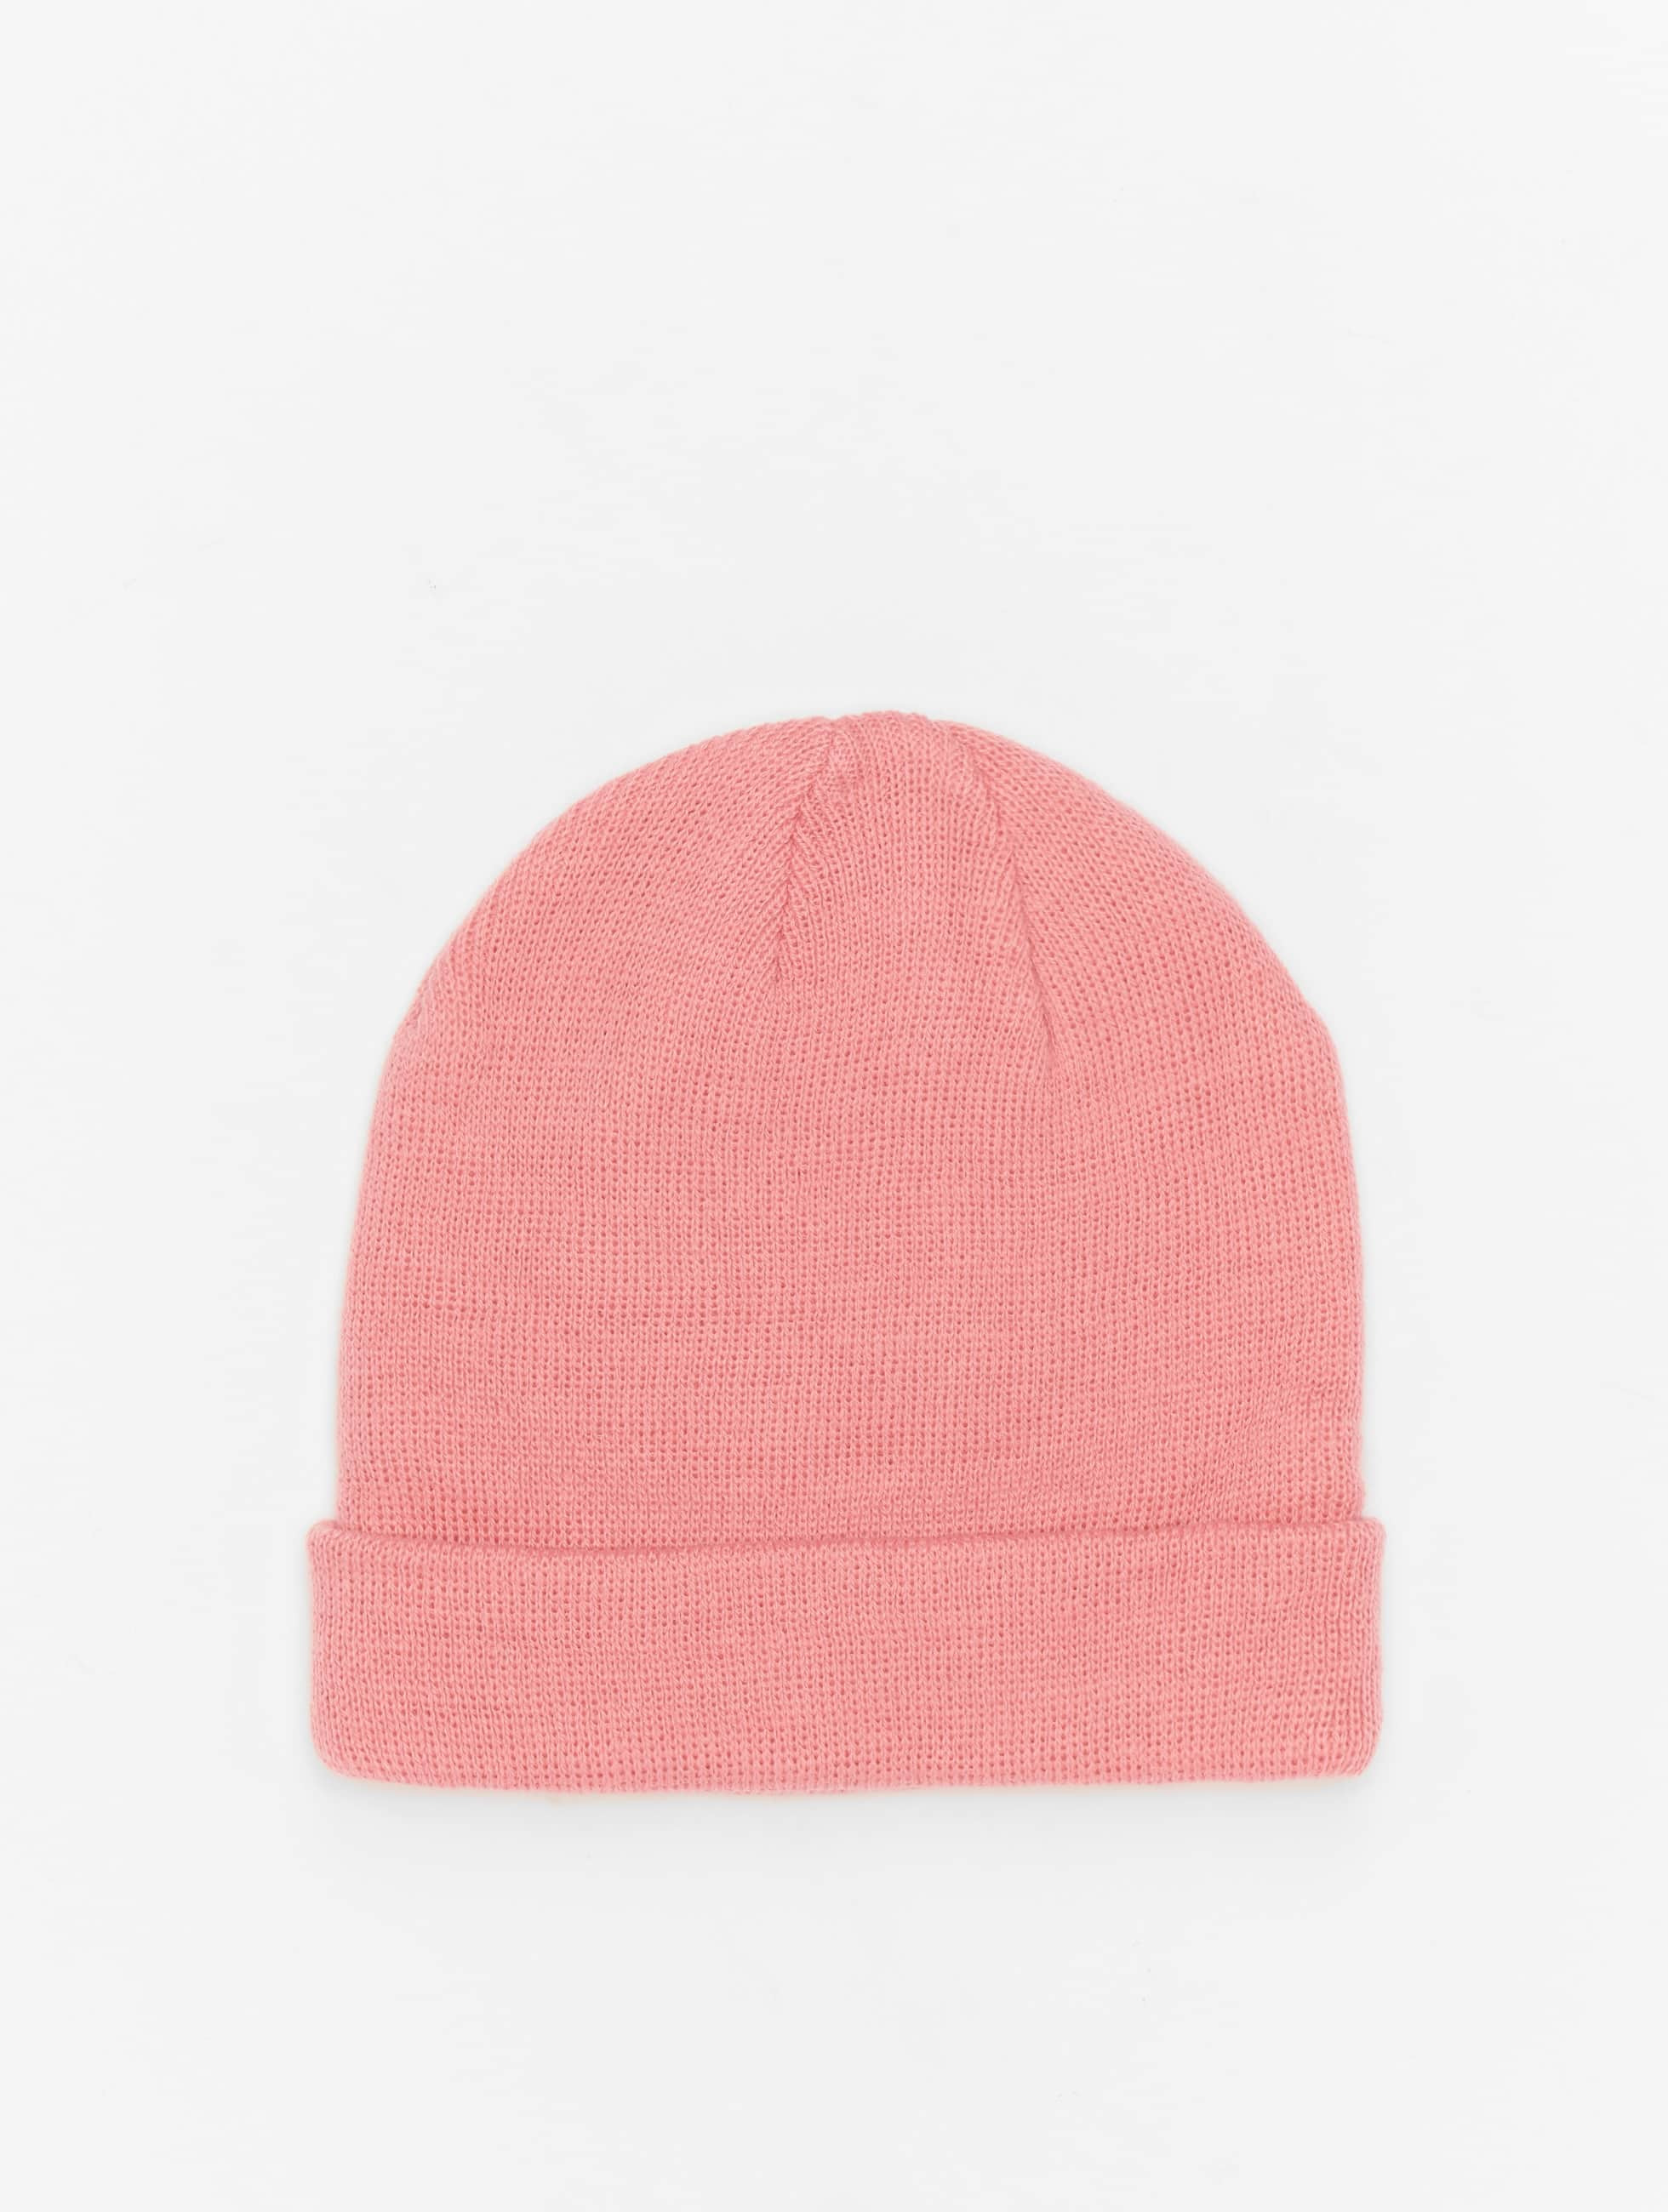 MSTRDS Bonnet Short Pastel Cuff Knit magenta